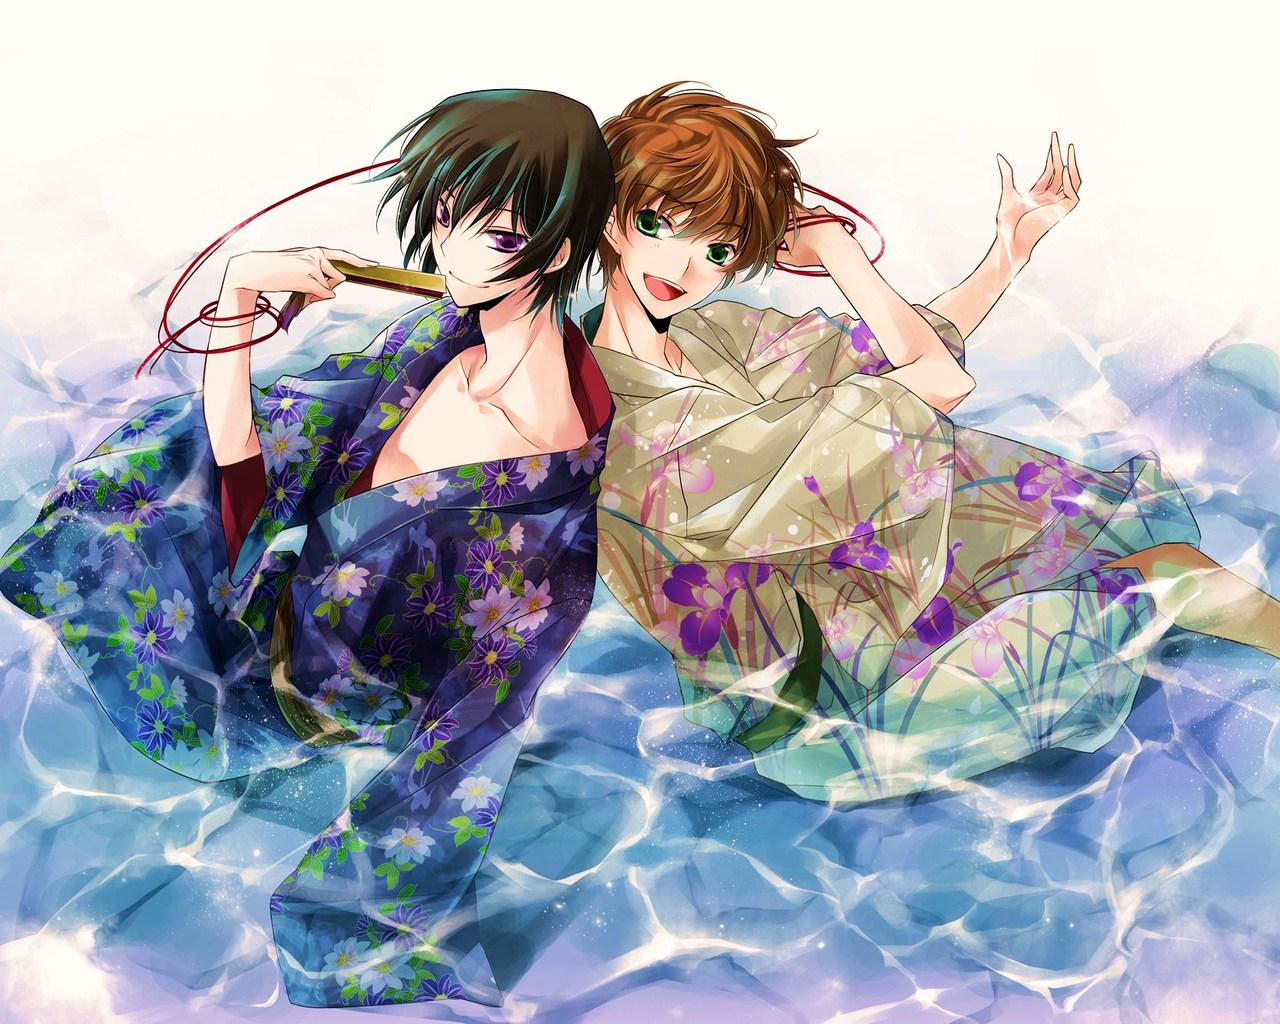 Code Geass HD Wallpaper 1280x1024   Your daily Anime Wallpaper and Fan HD Wide Wallpaper for Widescreen